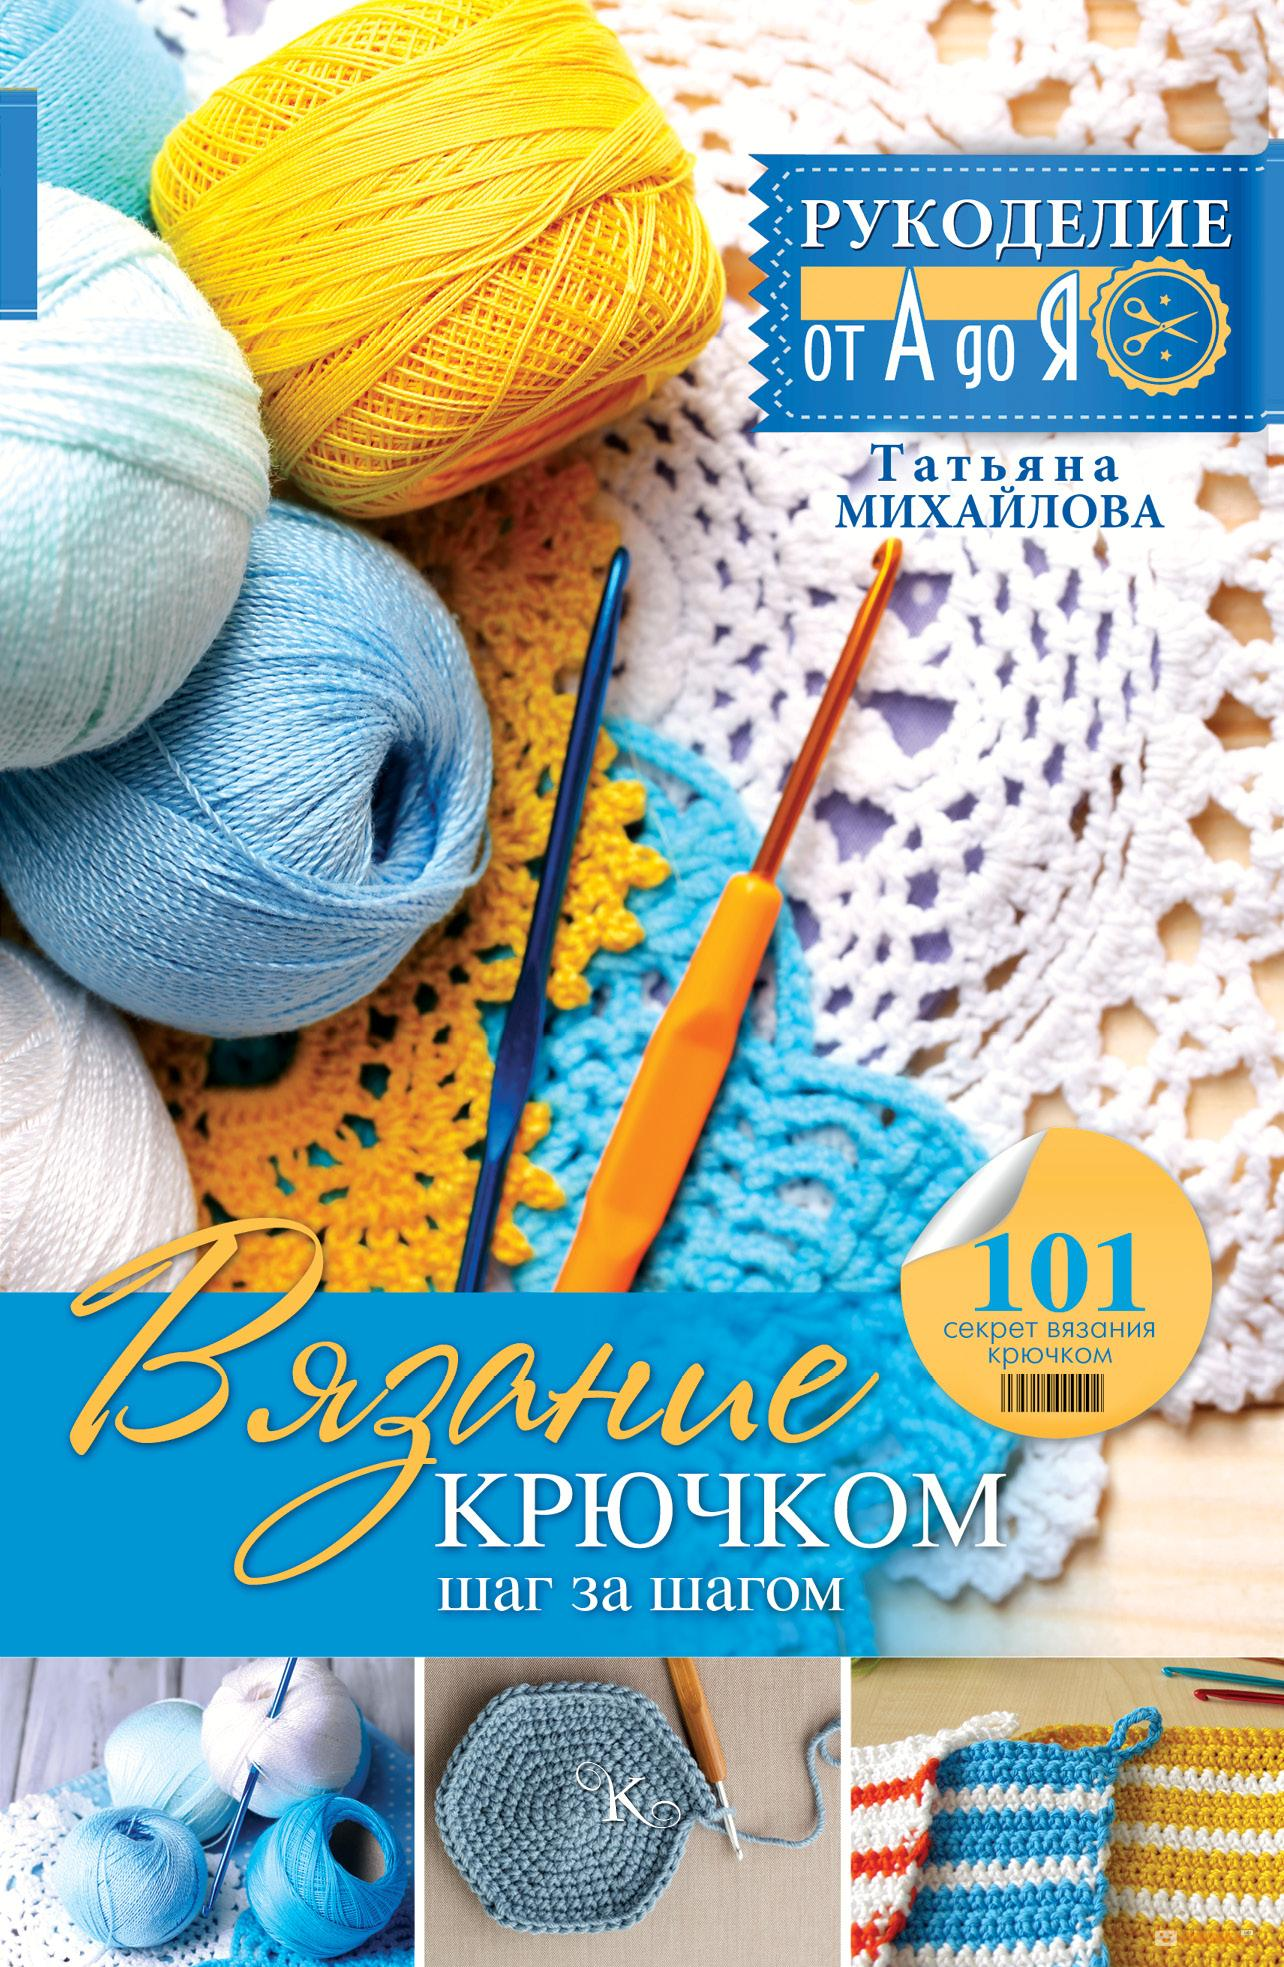 Купить Вязание крючком: шаг за шагом, Татьяна Михайлова, 978-5-17-095024-9